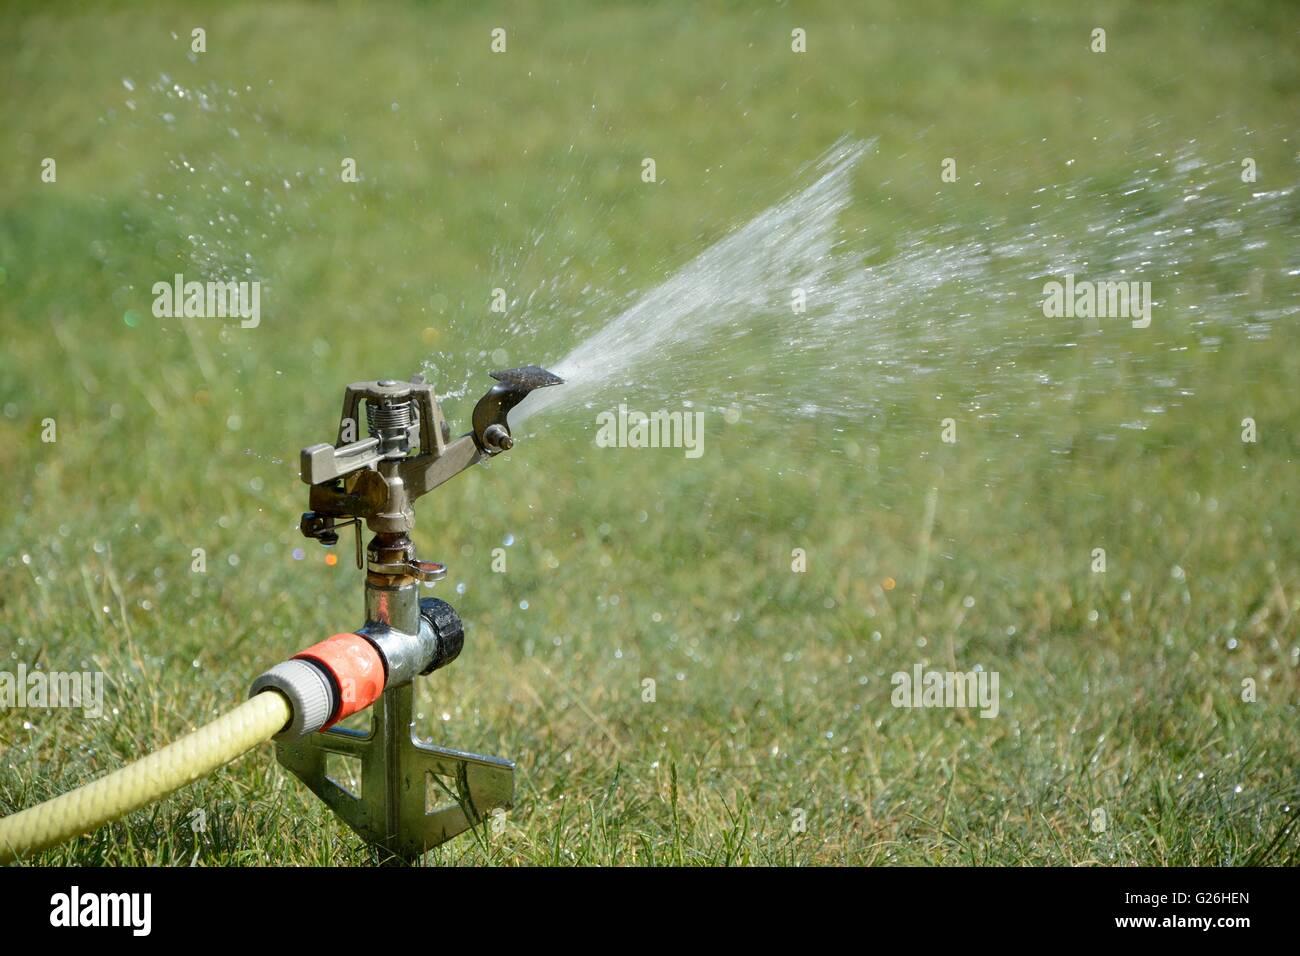 Sprinkler splashing with water on lawn in garden - Stock Image